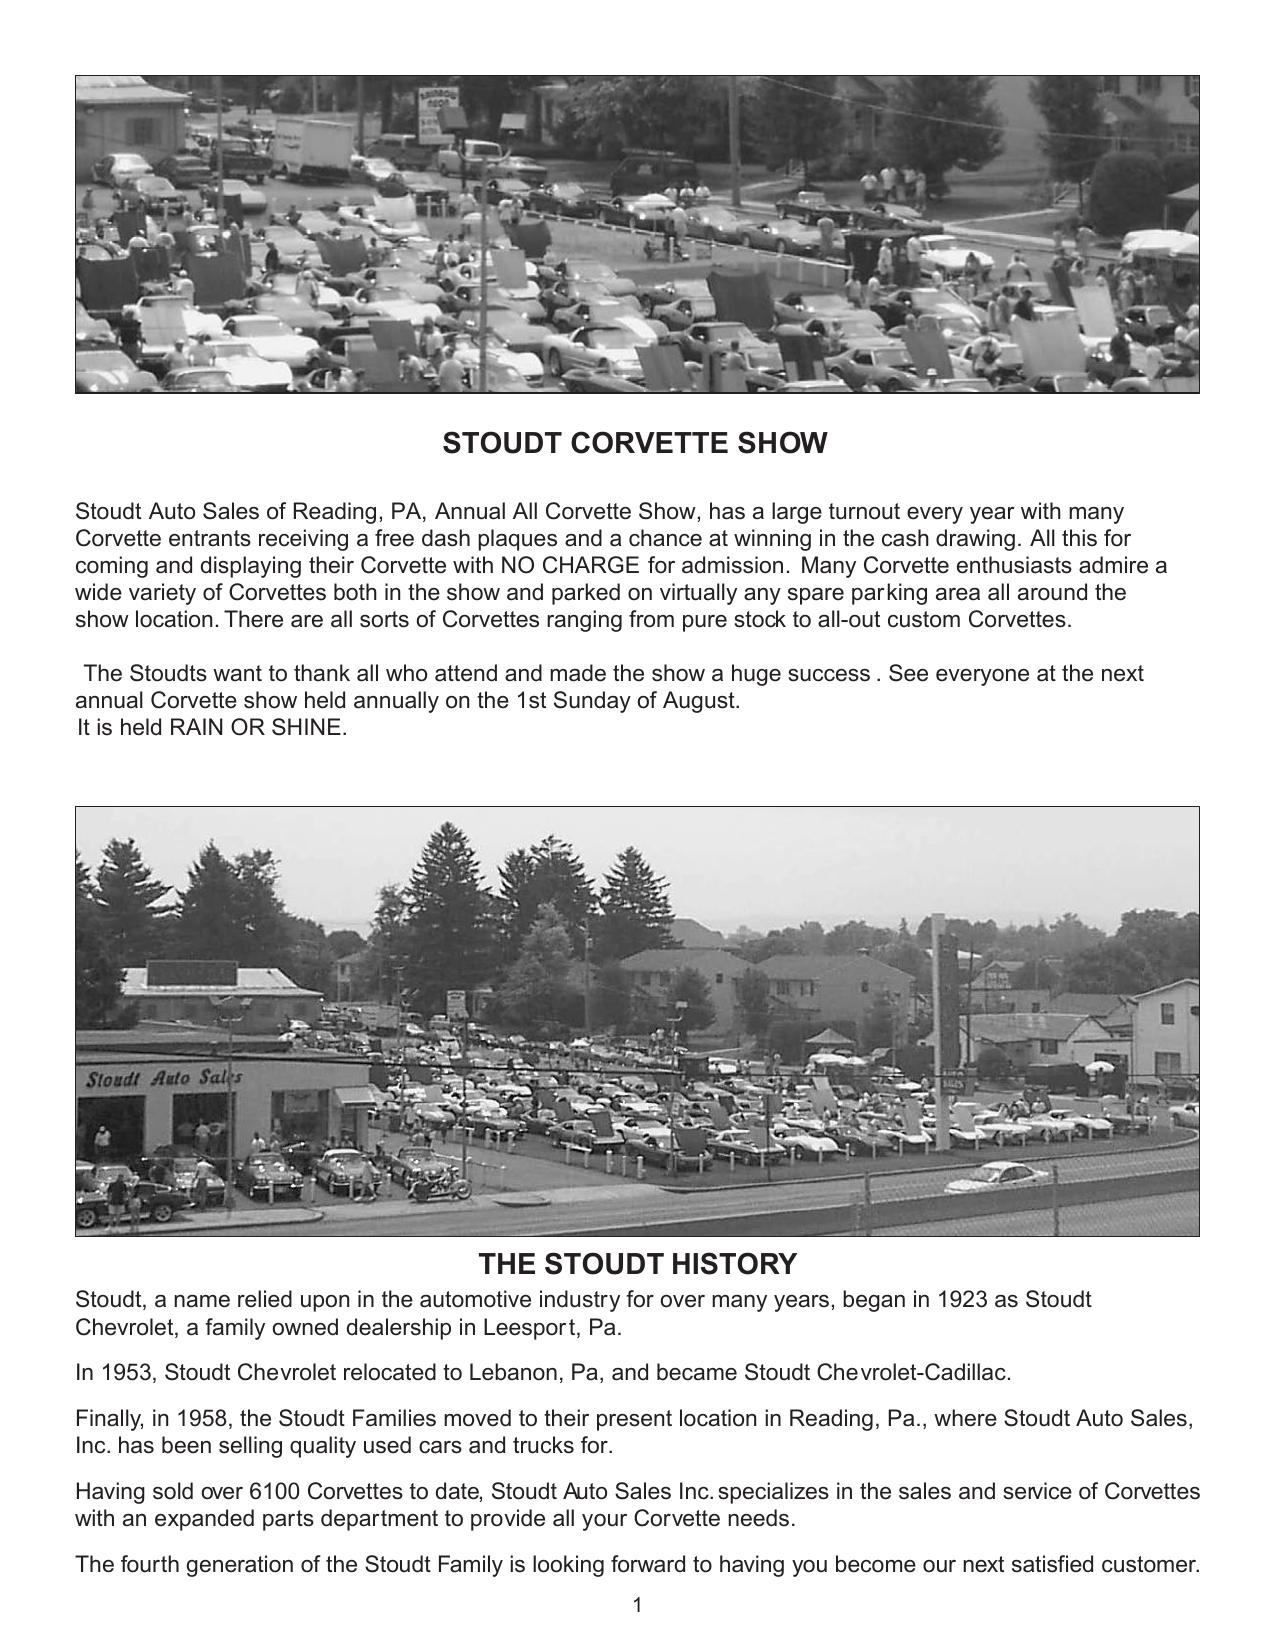 NOS 1958-60 Corvette Front Liscense Plate Bumperette Brkts